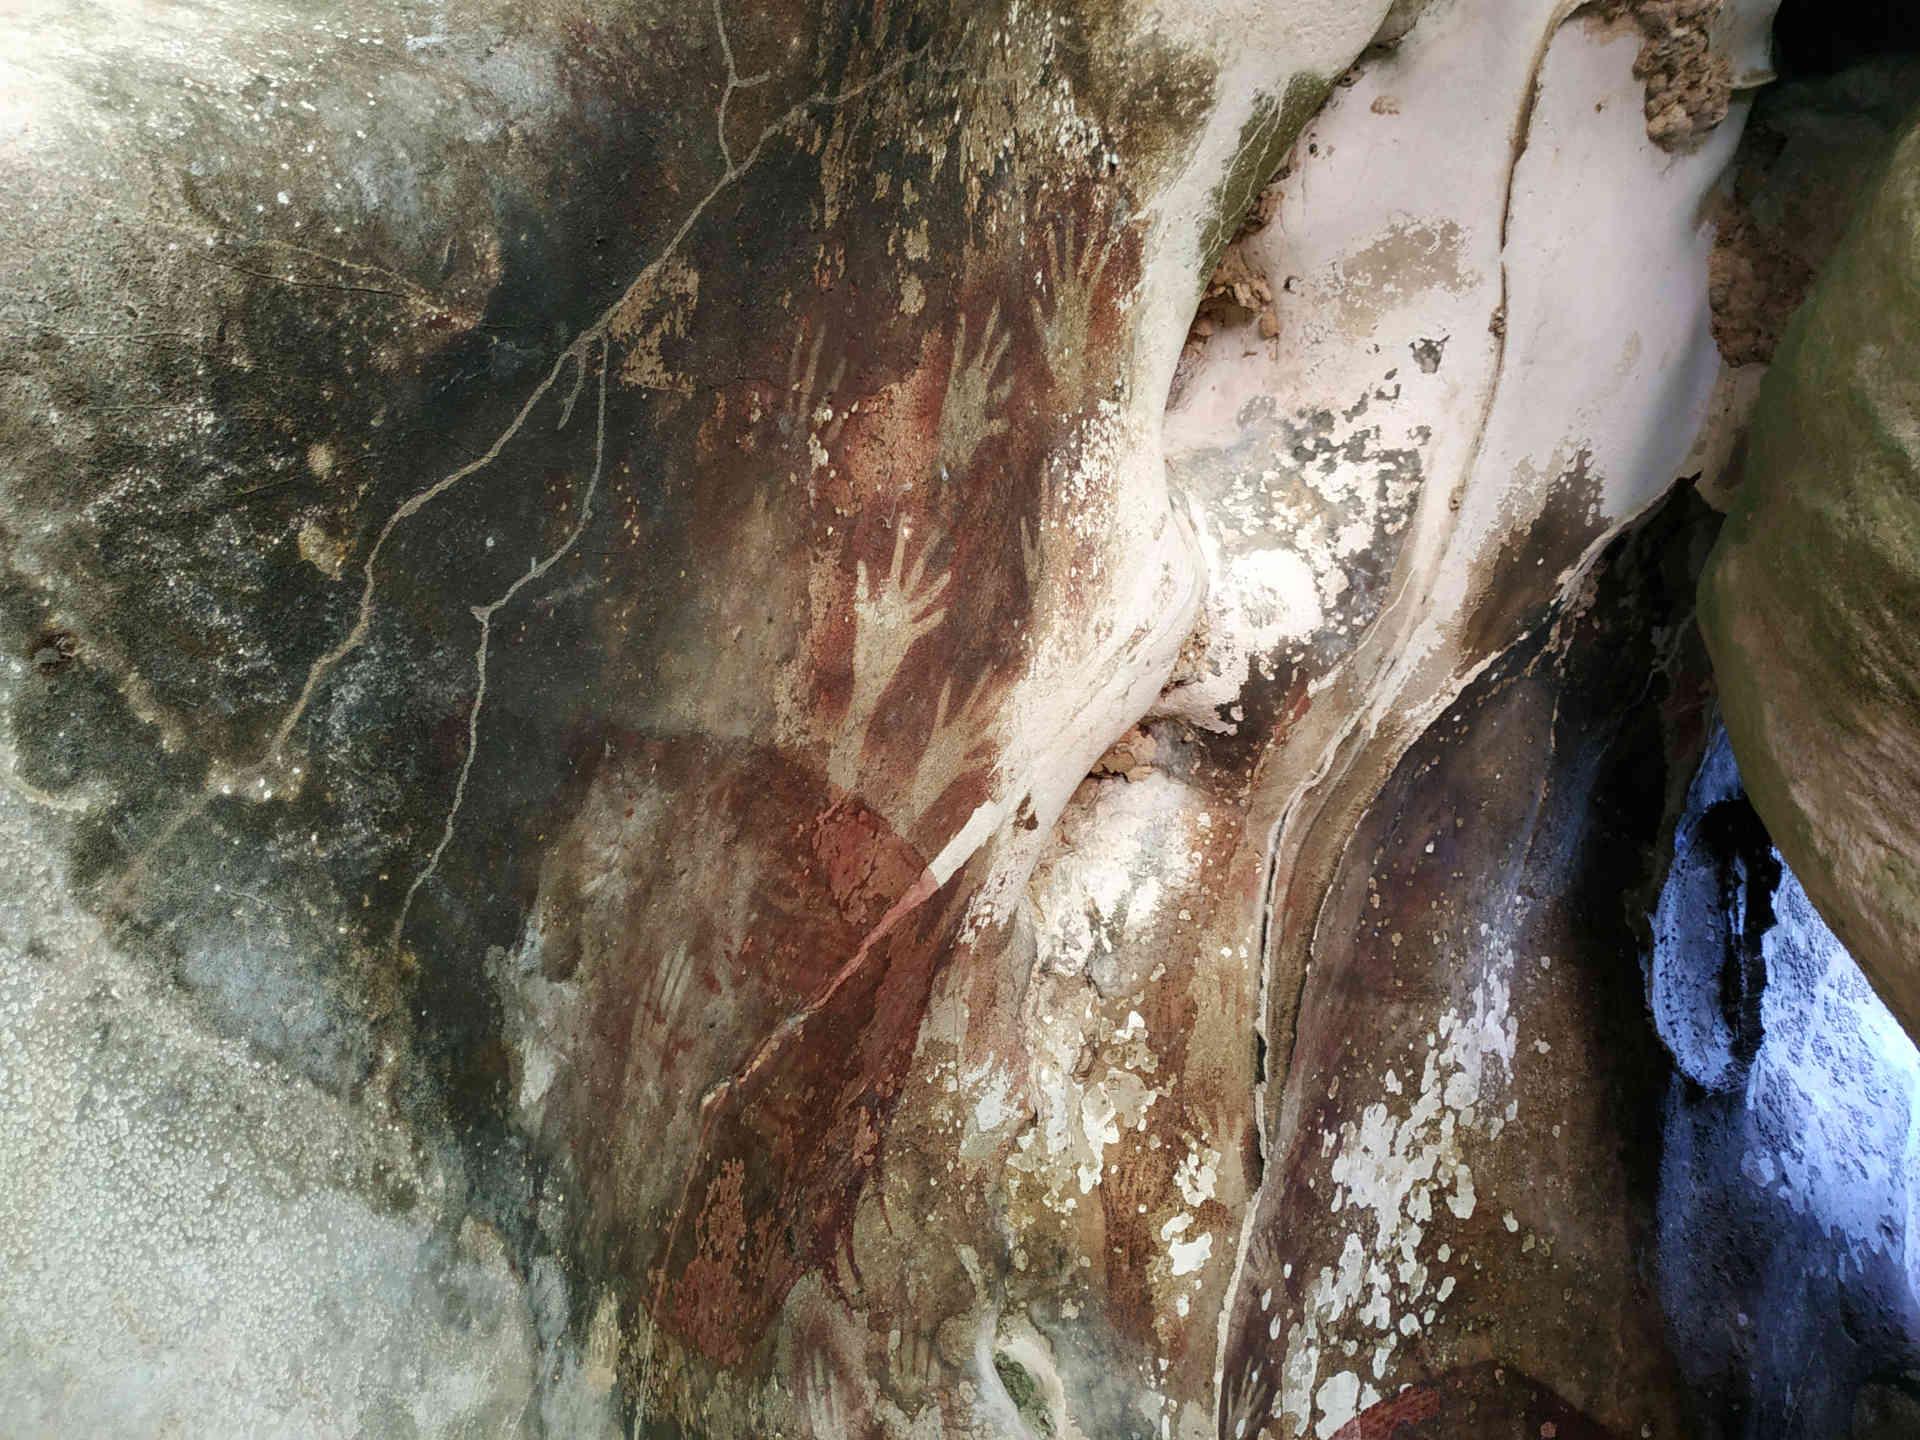 Sulawesi Maros Cave Exploration 3